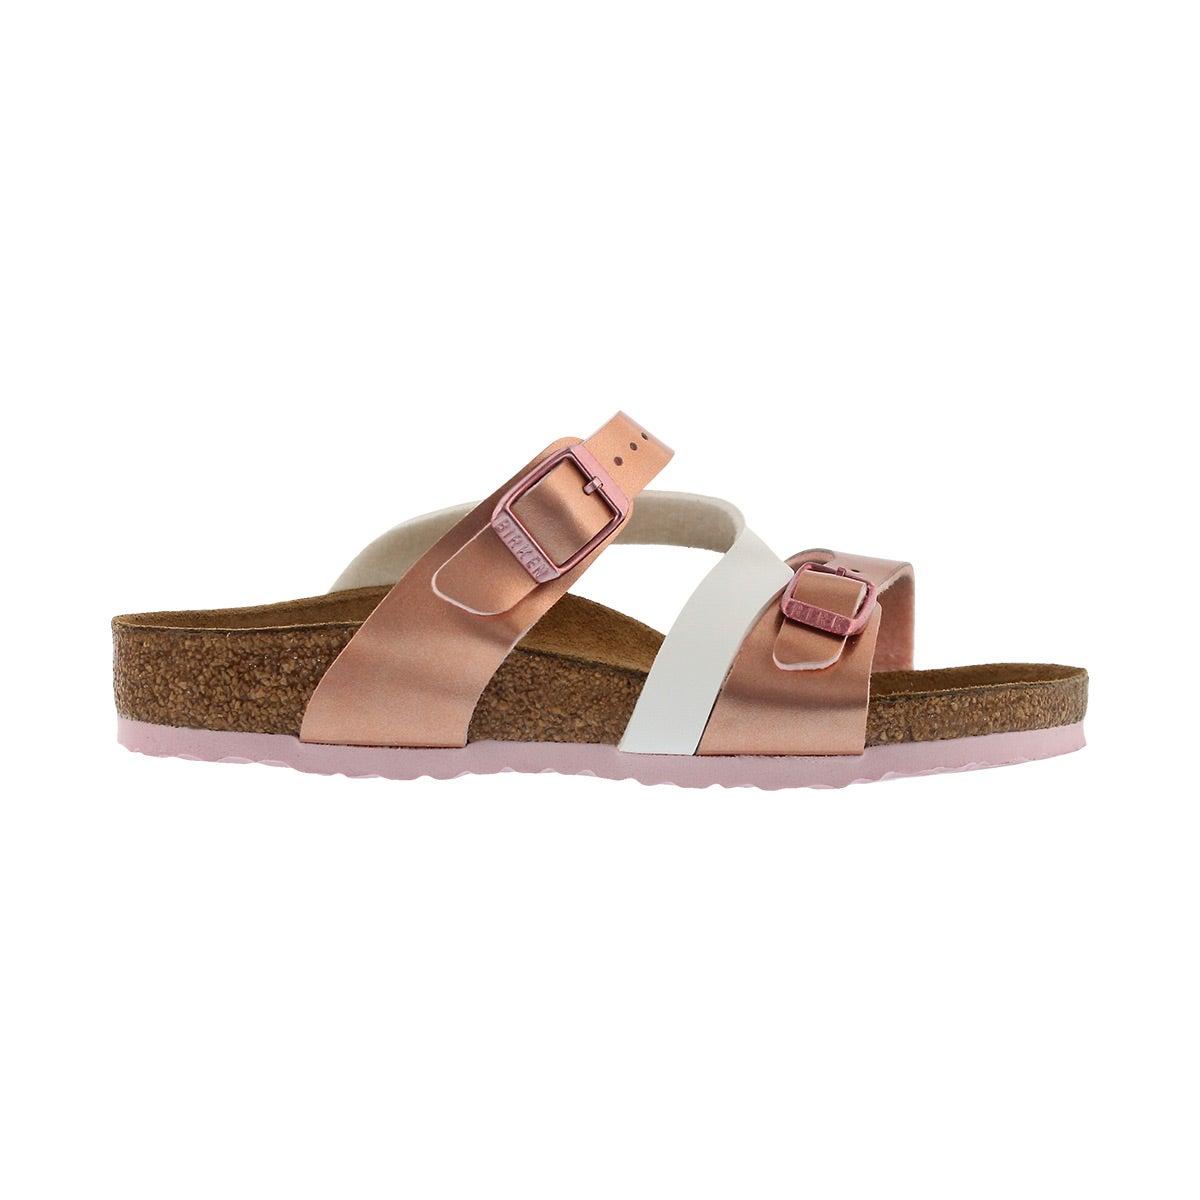 Grls Salina BF sft mtlcs rse wht sandal